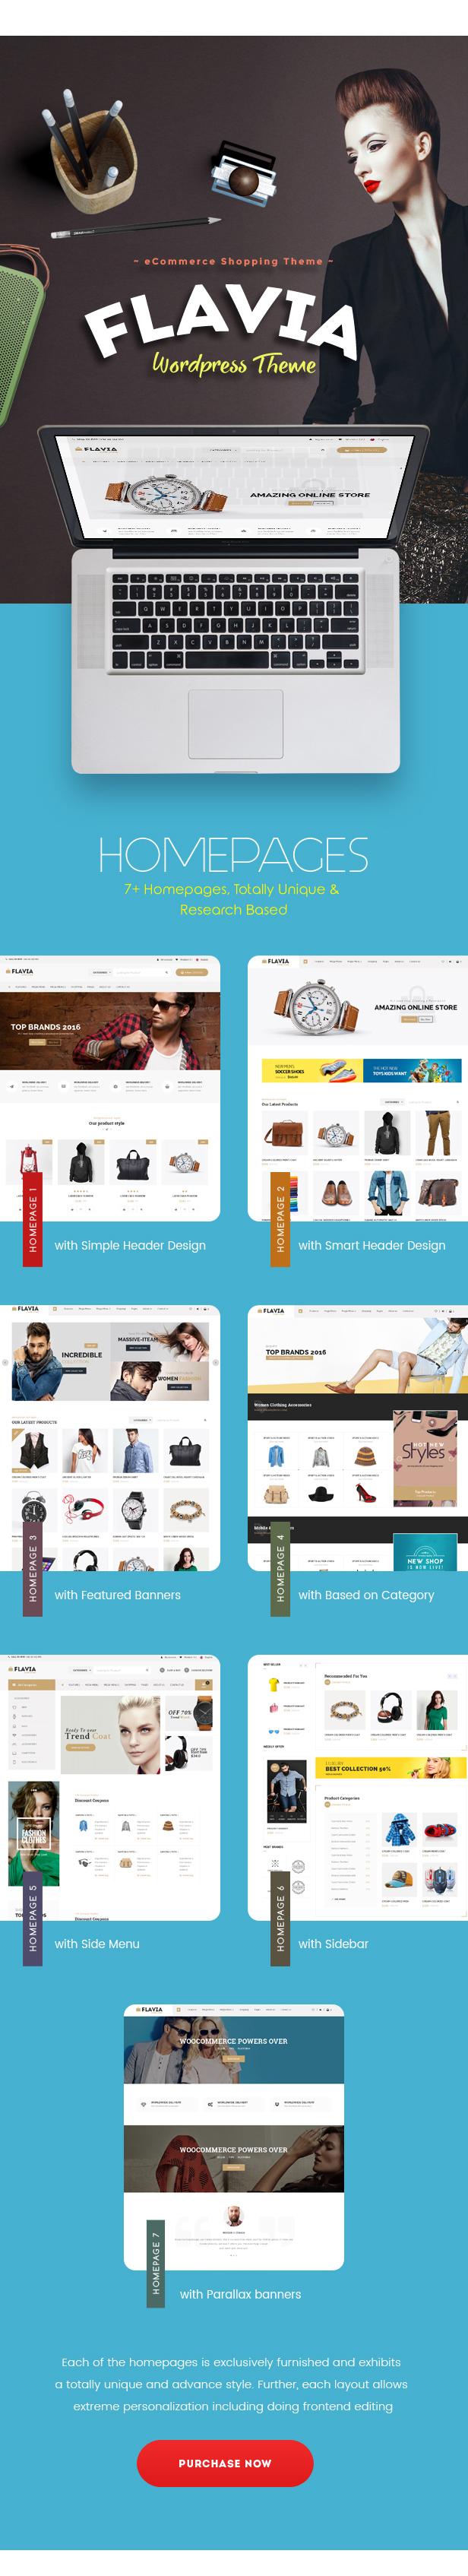 Flavia - Download Responsive WooCommerce WordPress Theme 2020 - 2